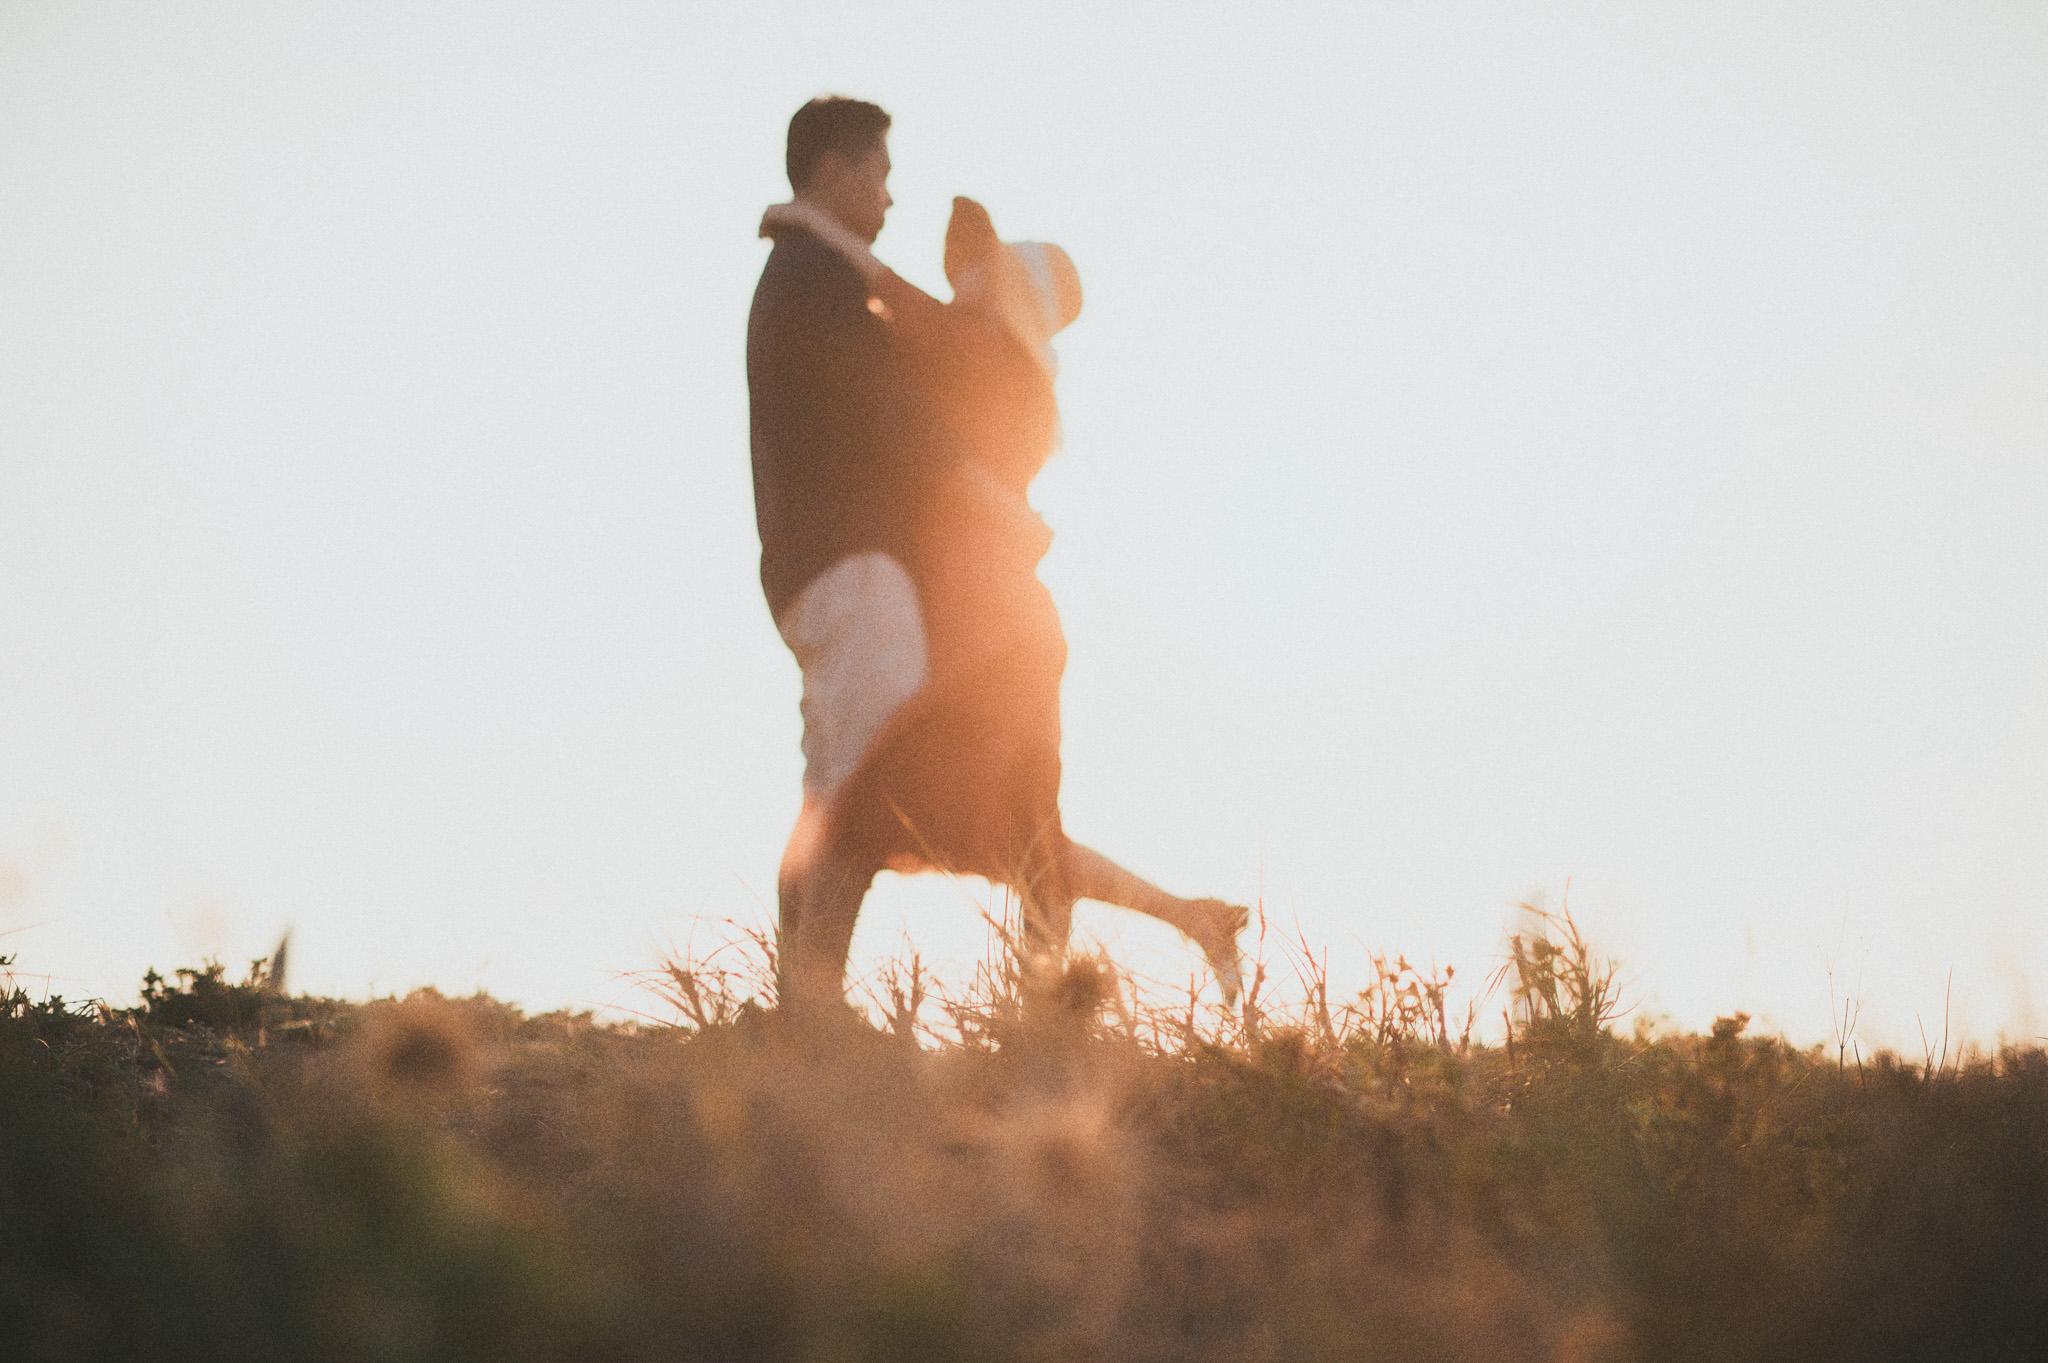 EW Easternwedding JMH婚攝 居米 婚紗 台北 沙崙 便服